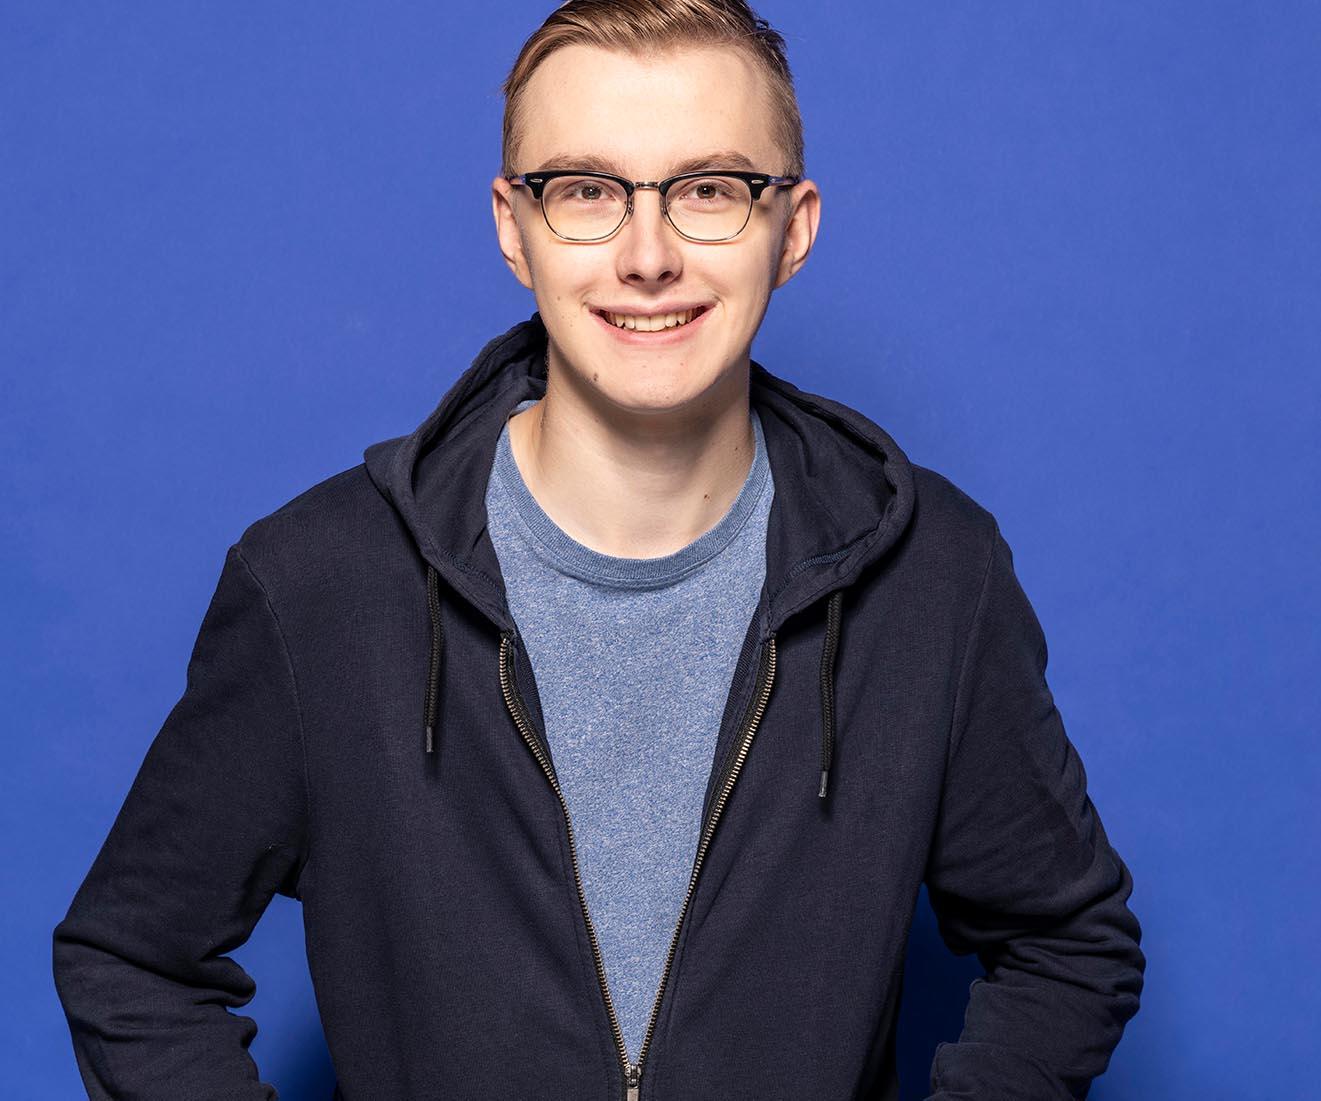 Porträt Florian Entwicklung Azubi-Kampagne für Westfalen Group, Webdesign, Videoclips, Social-Media, Werbung